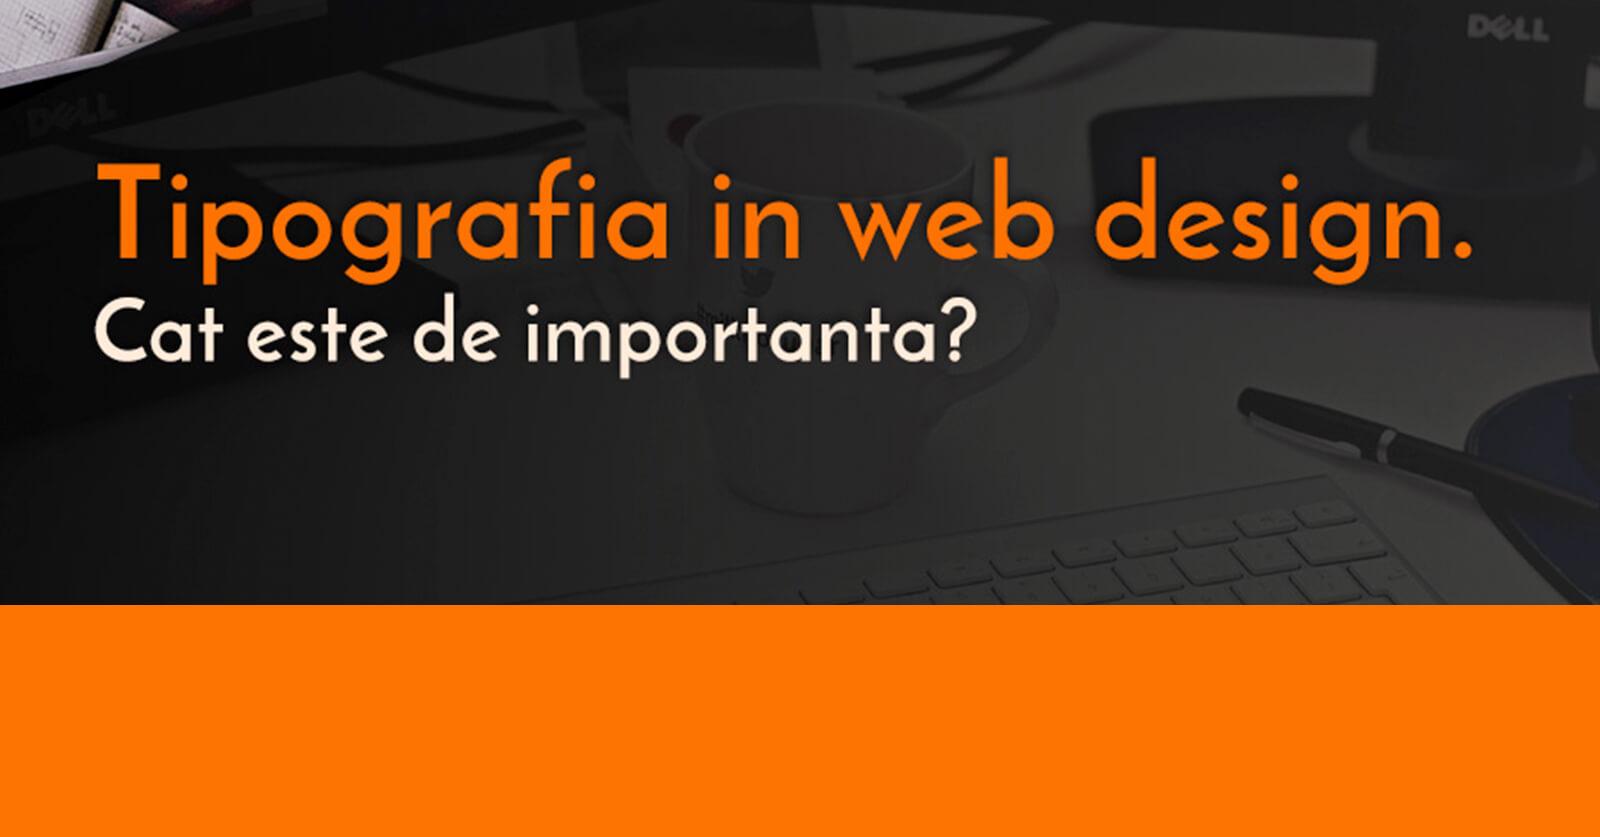 Tipografia in web design – cat este de importanta?